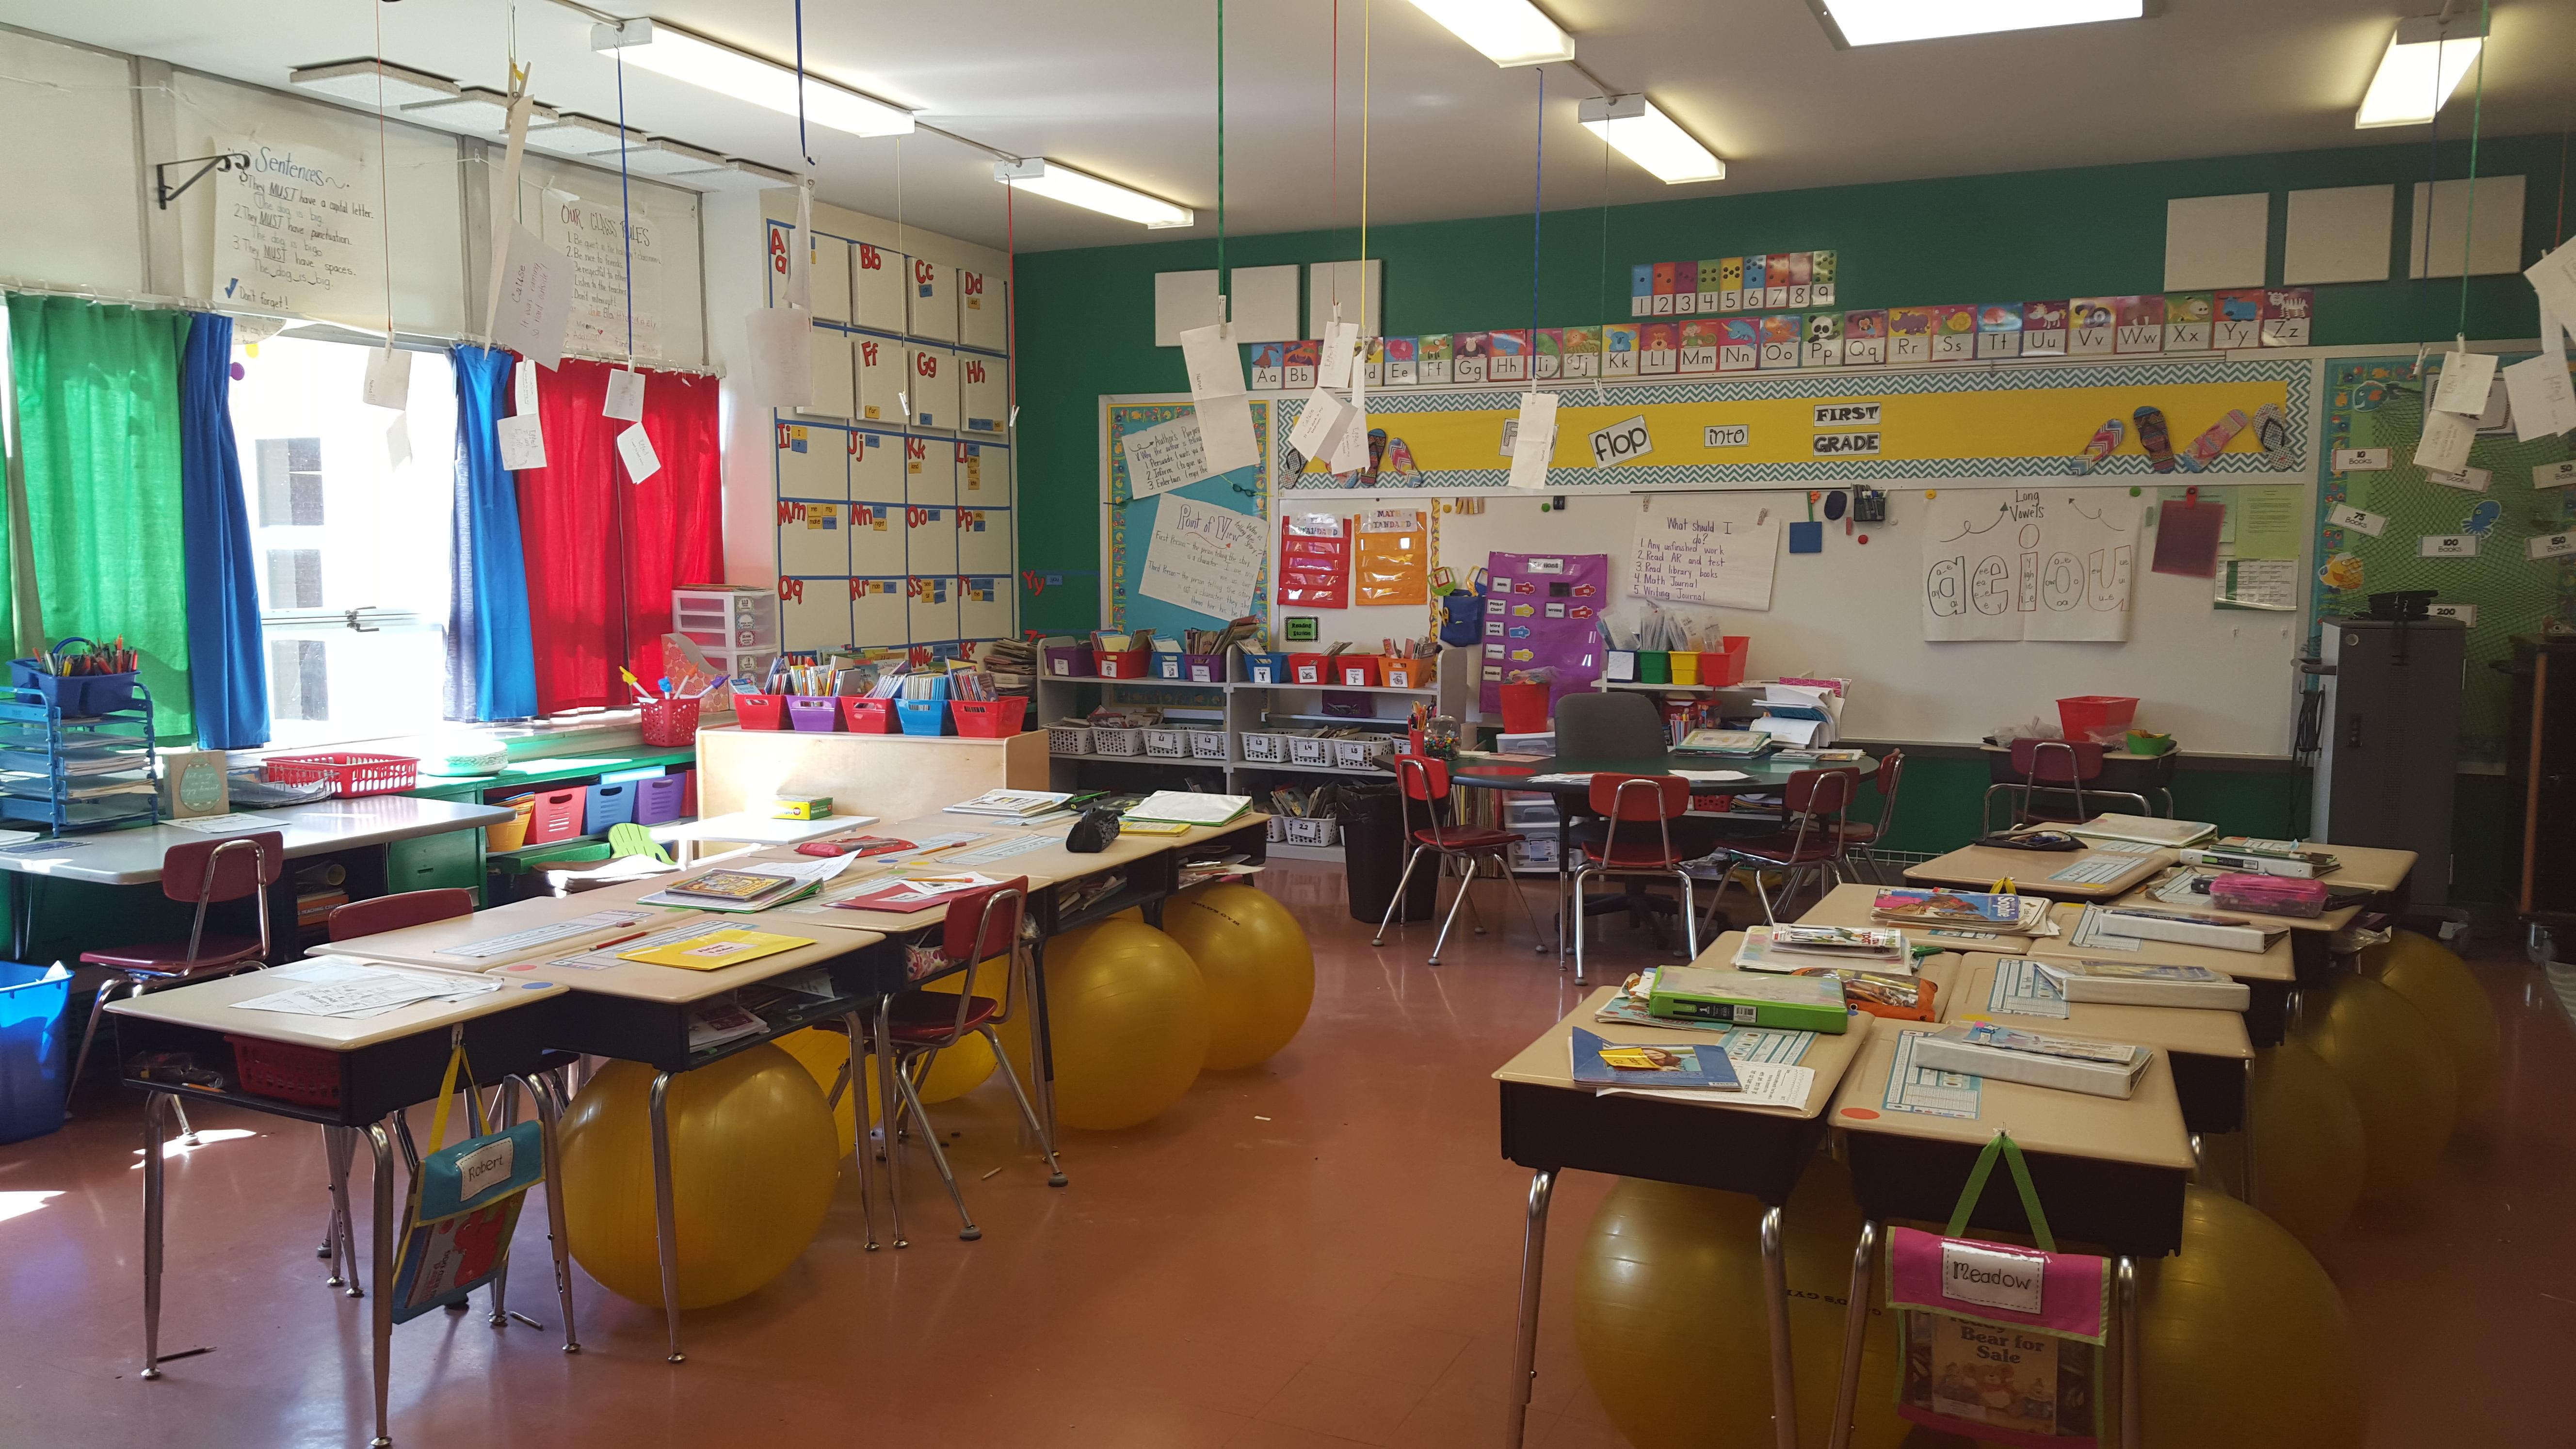 classroomviewjessicenatiempo.jpg - Classroom view